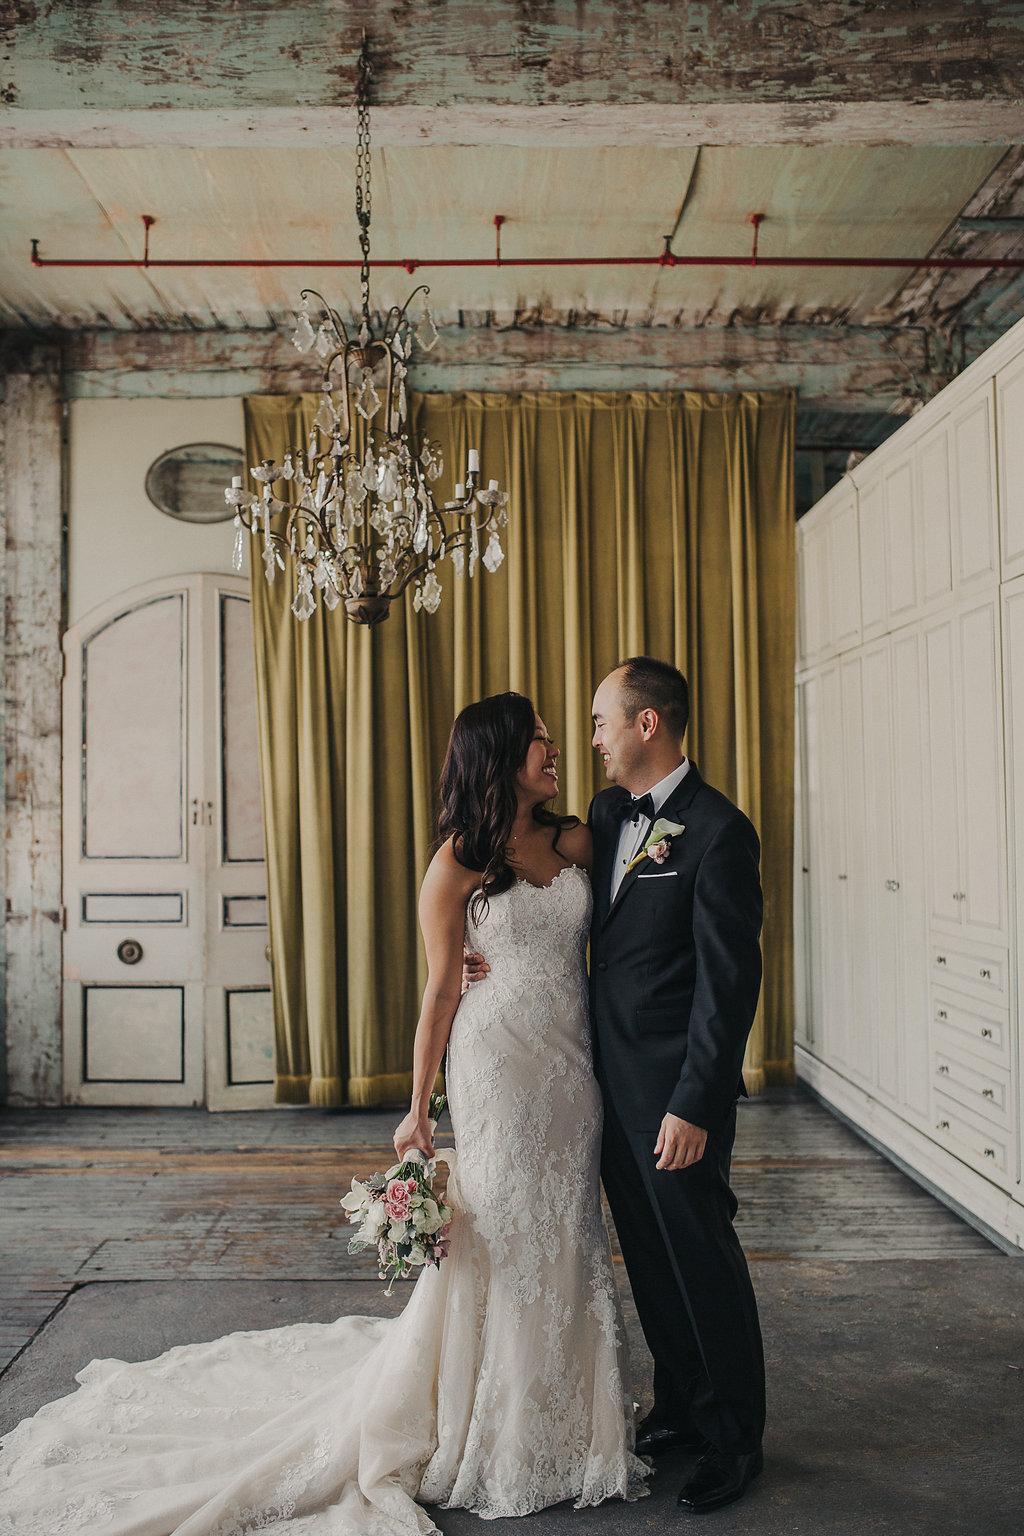 wedding portraits - photo by Loreto Caceres Photography https://ruffledblog.com/intimate-vietnamese-wedding-at-metropolitan-building